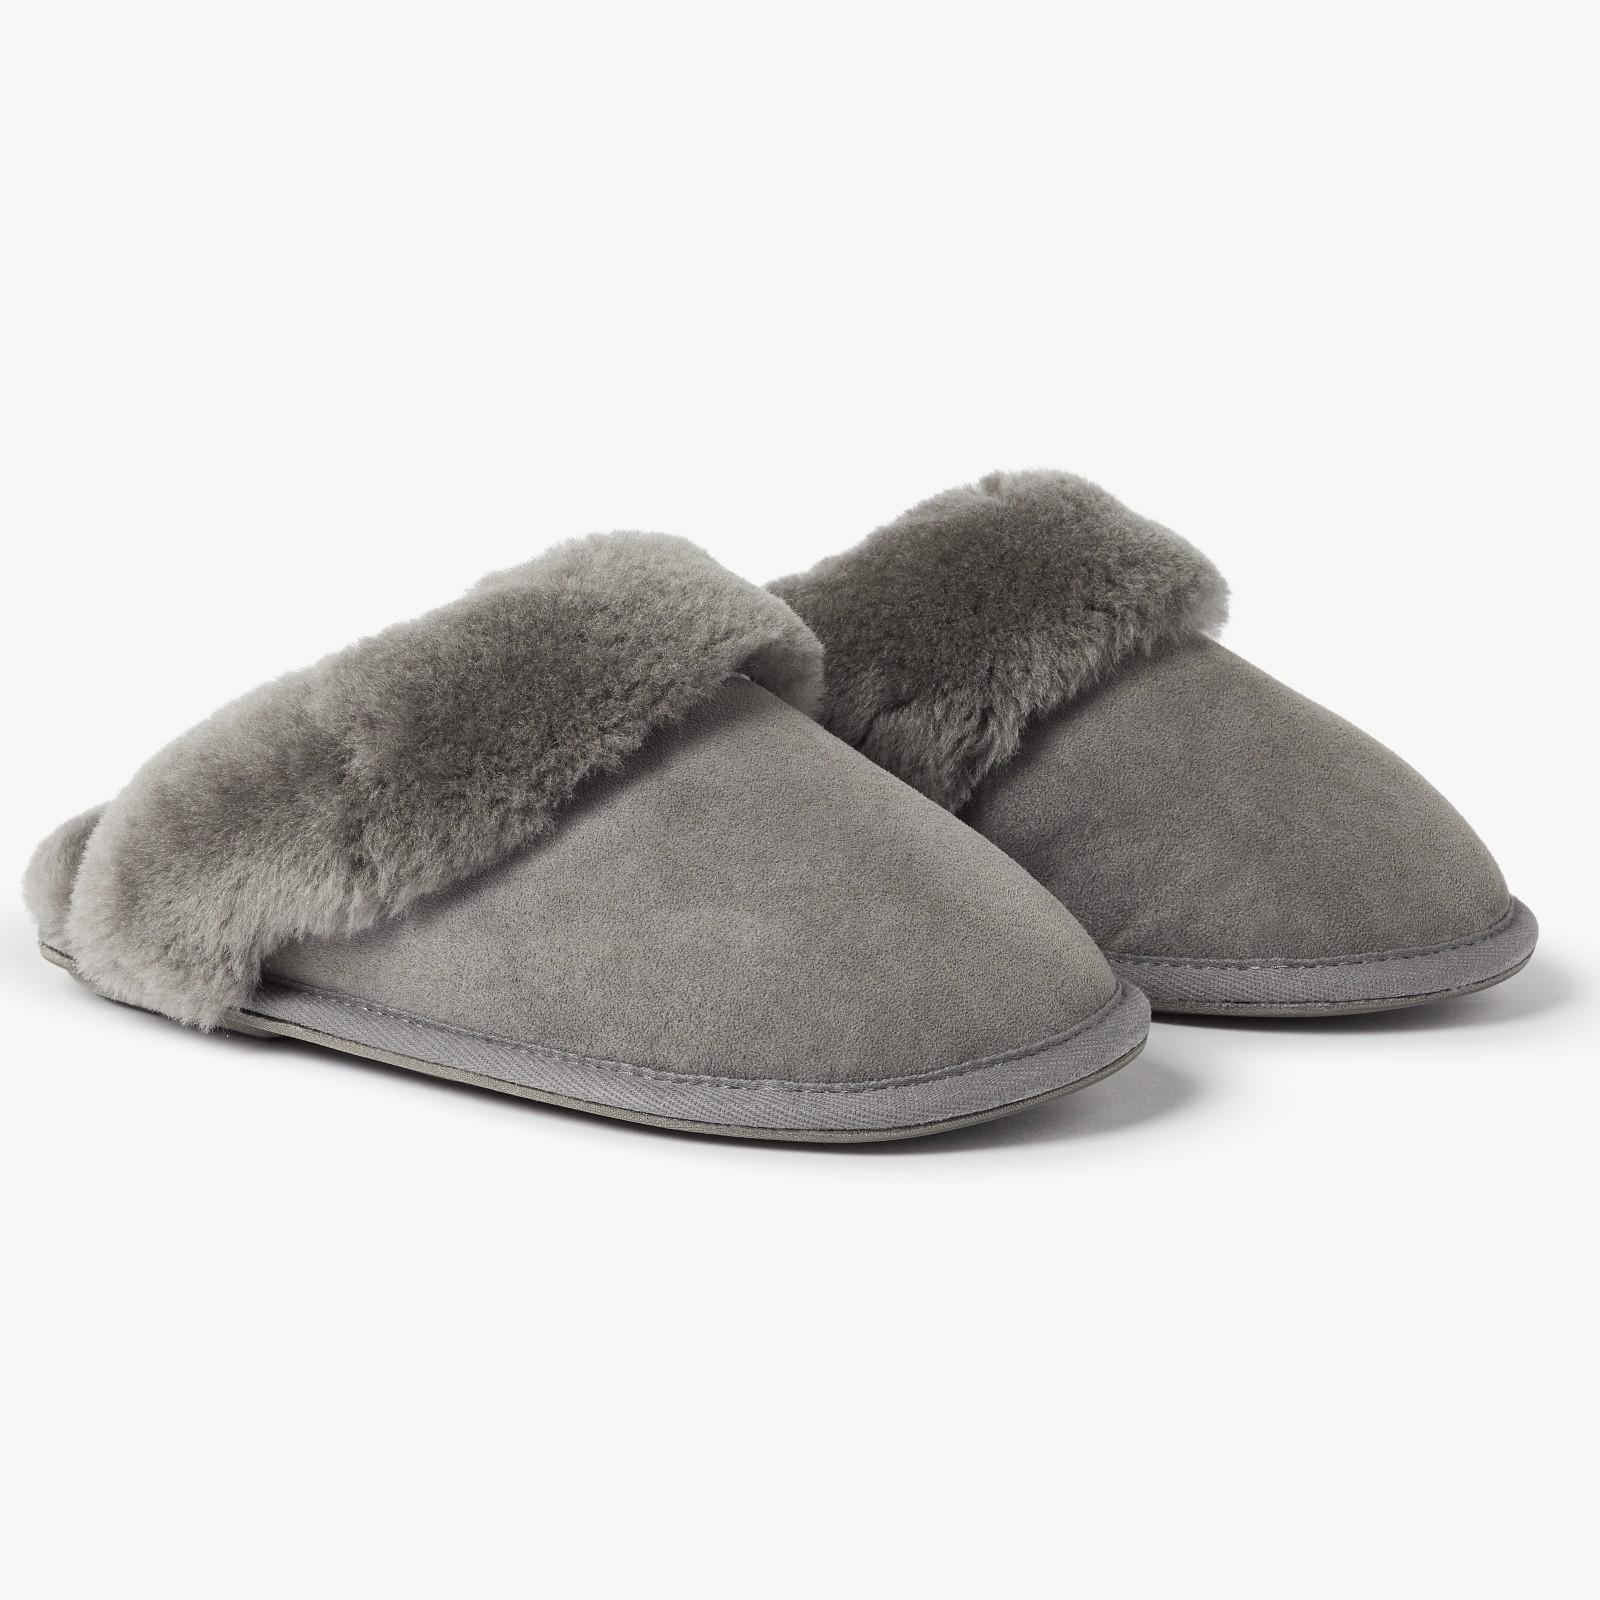 0a632c9a5f4a John Lewis Sheepskin Mule Slippers in Gray - Lyst